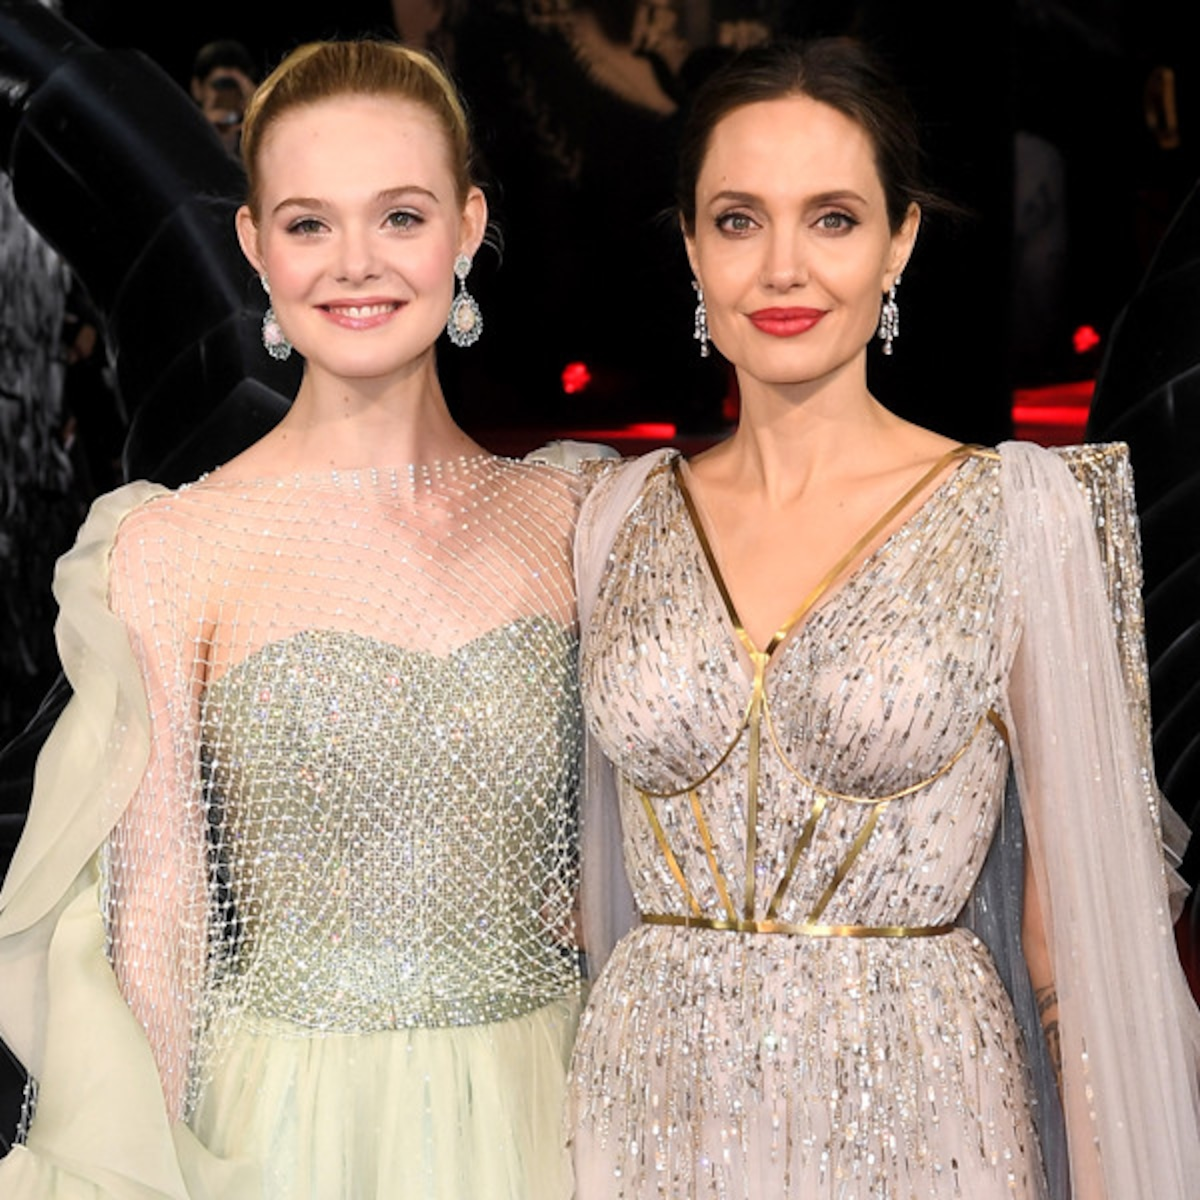 Angelina Jolie And Elle Fanning Look Like Real Life Disney